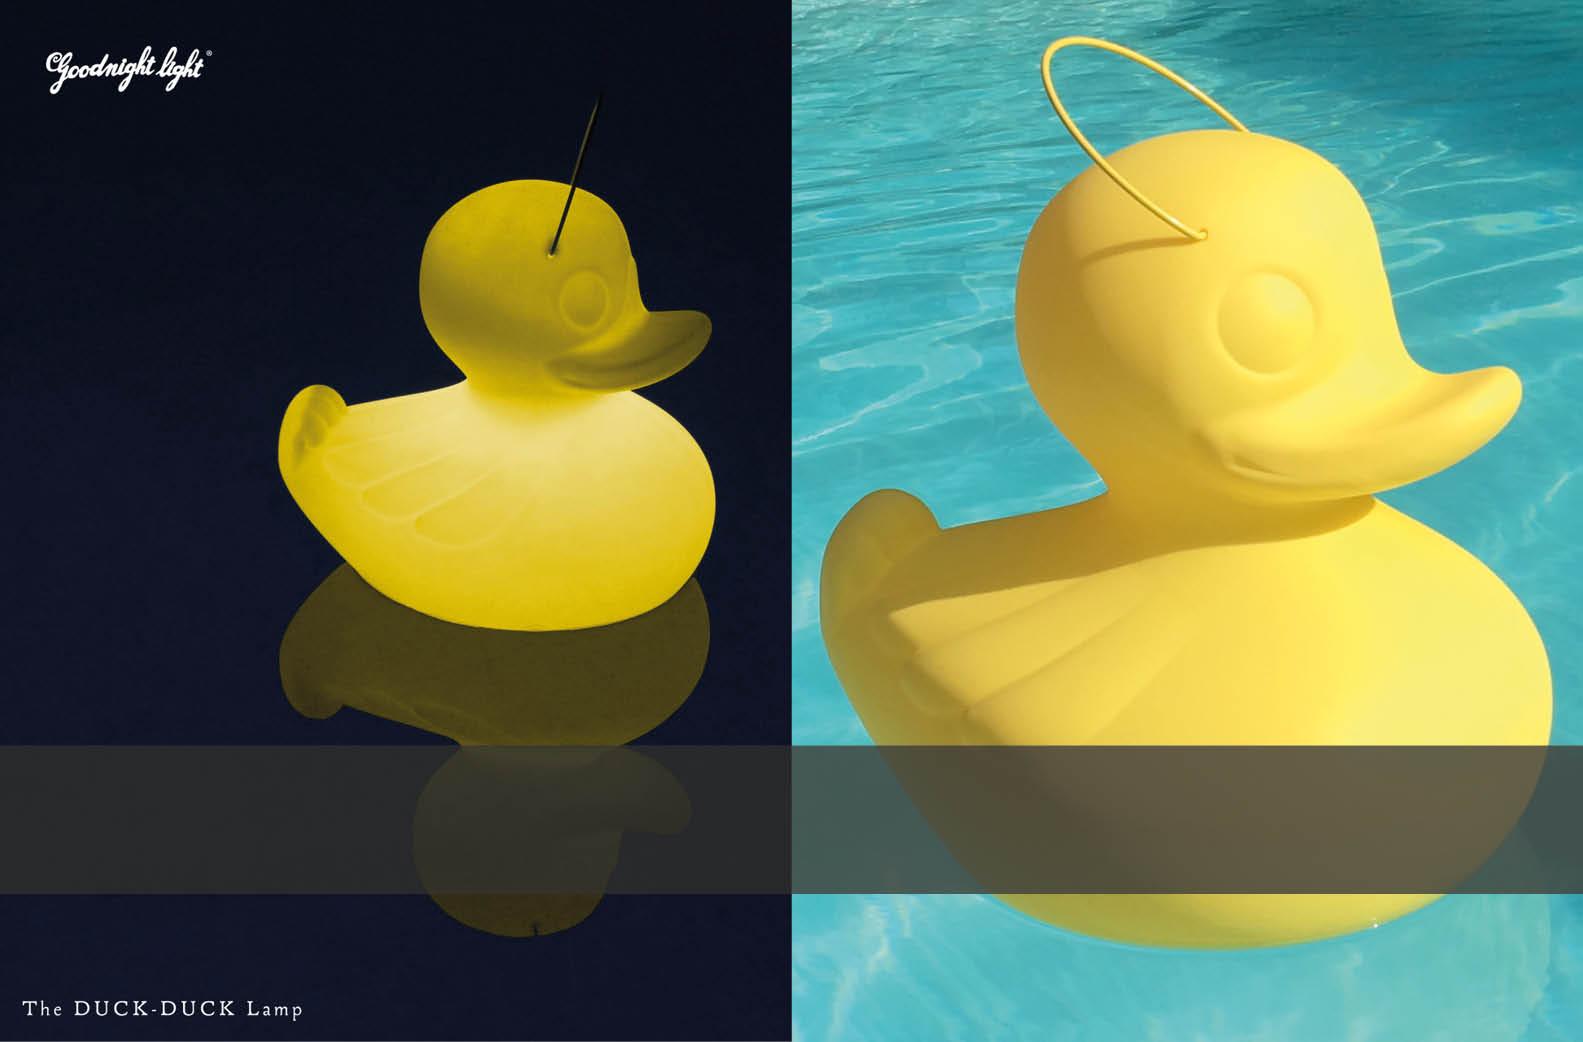 Goodnight Light Duck Duck